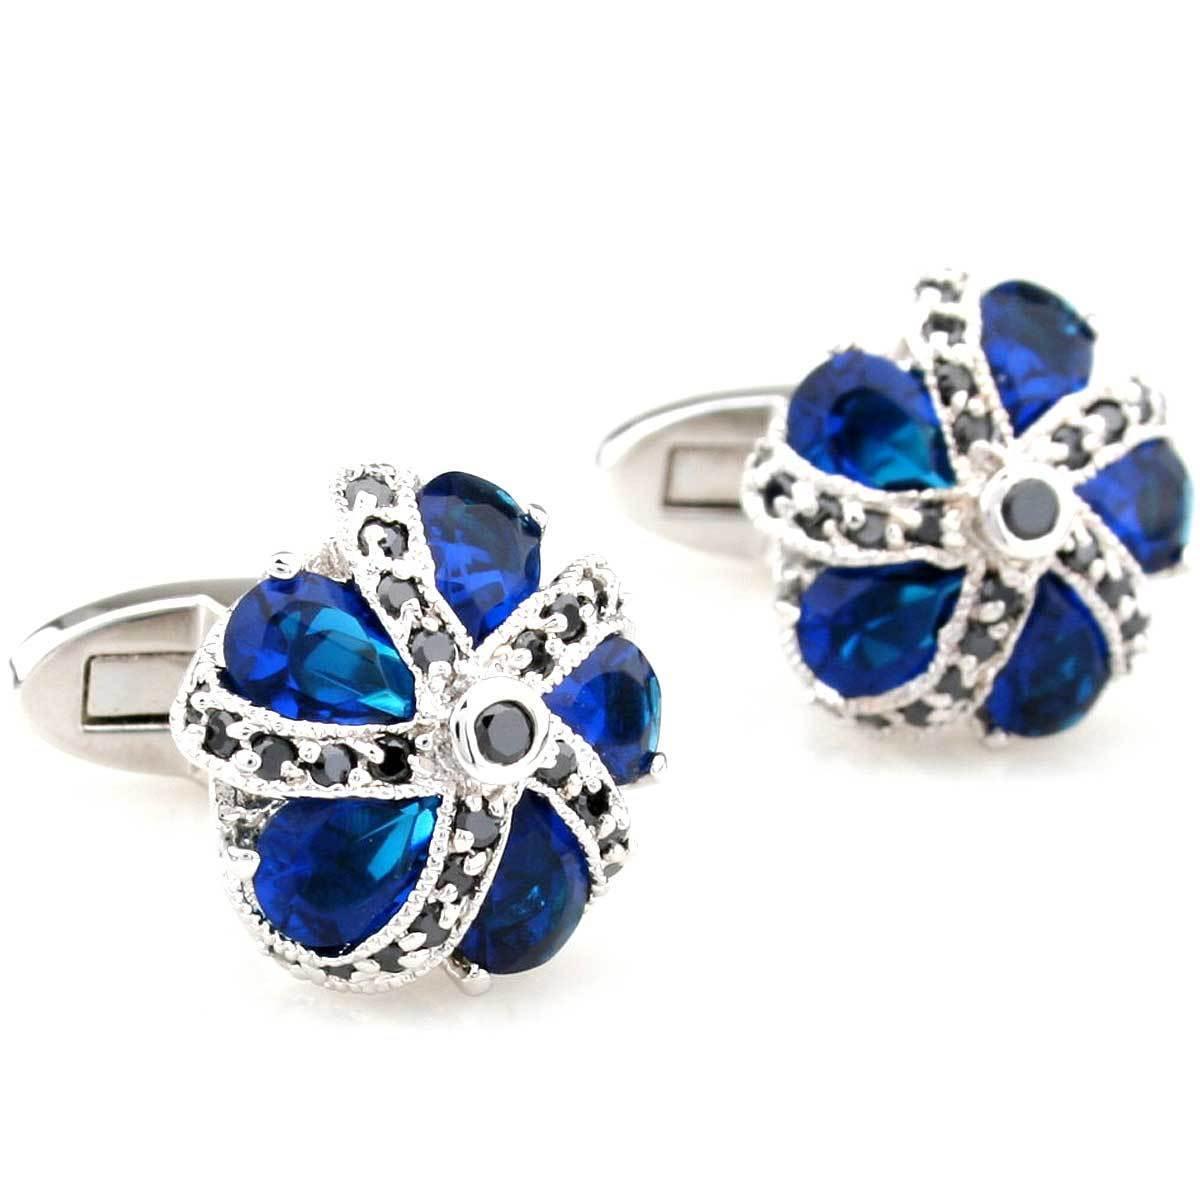 Cufflinks Retail Zircon series male blue black multicolour three-color cufflinks nail sleeve 250021 free shipping+free gift box стоимость